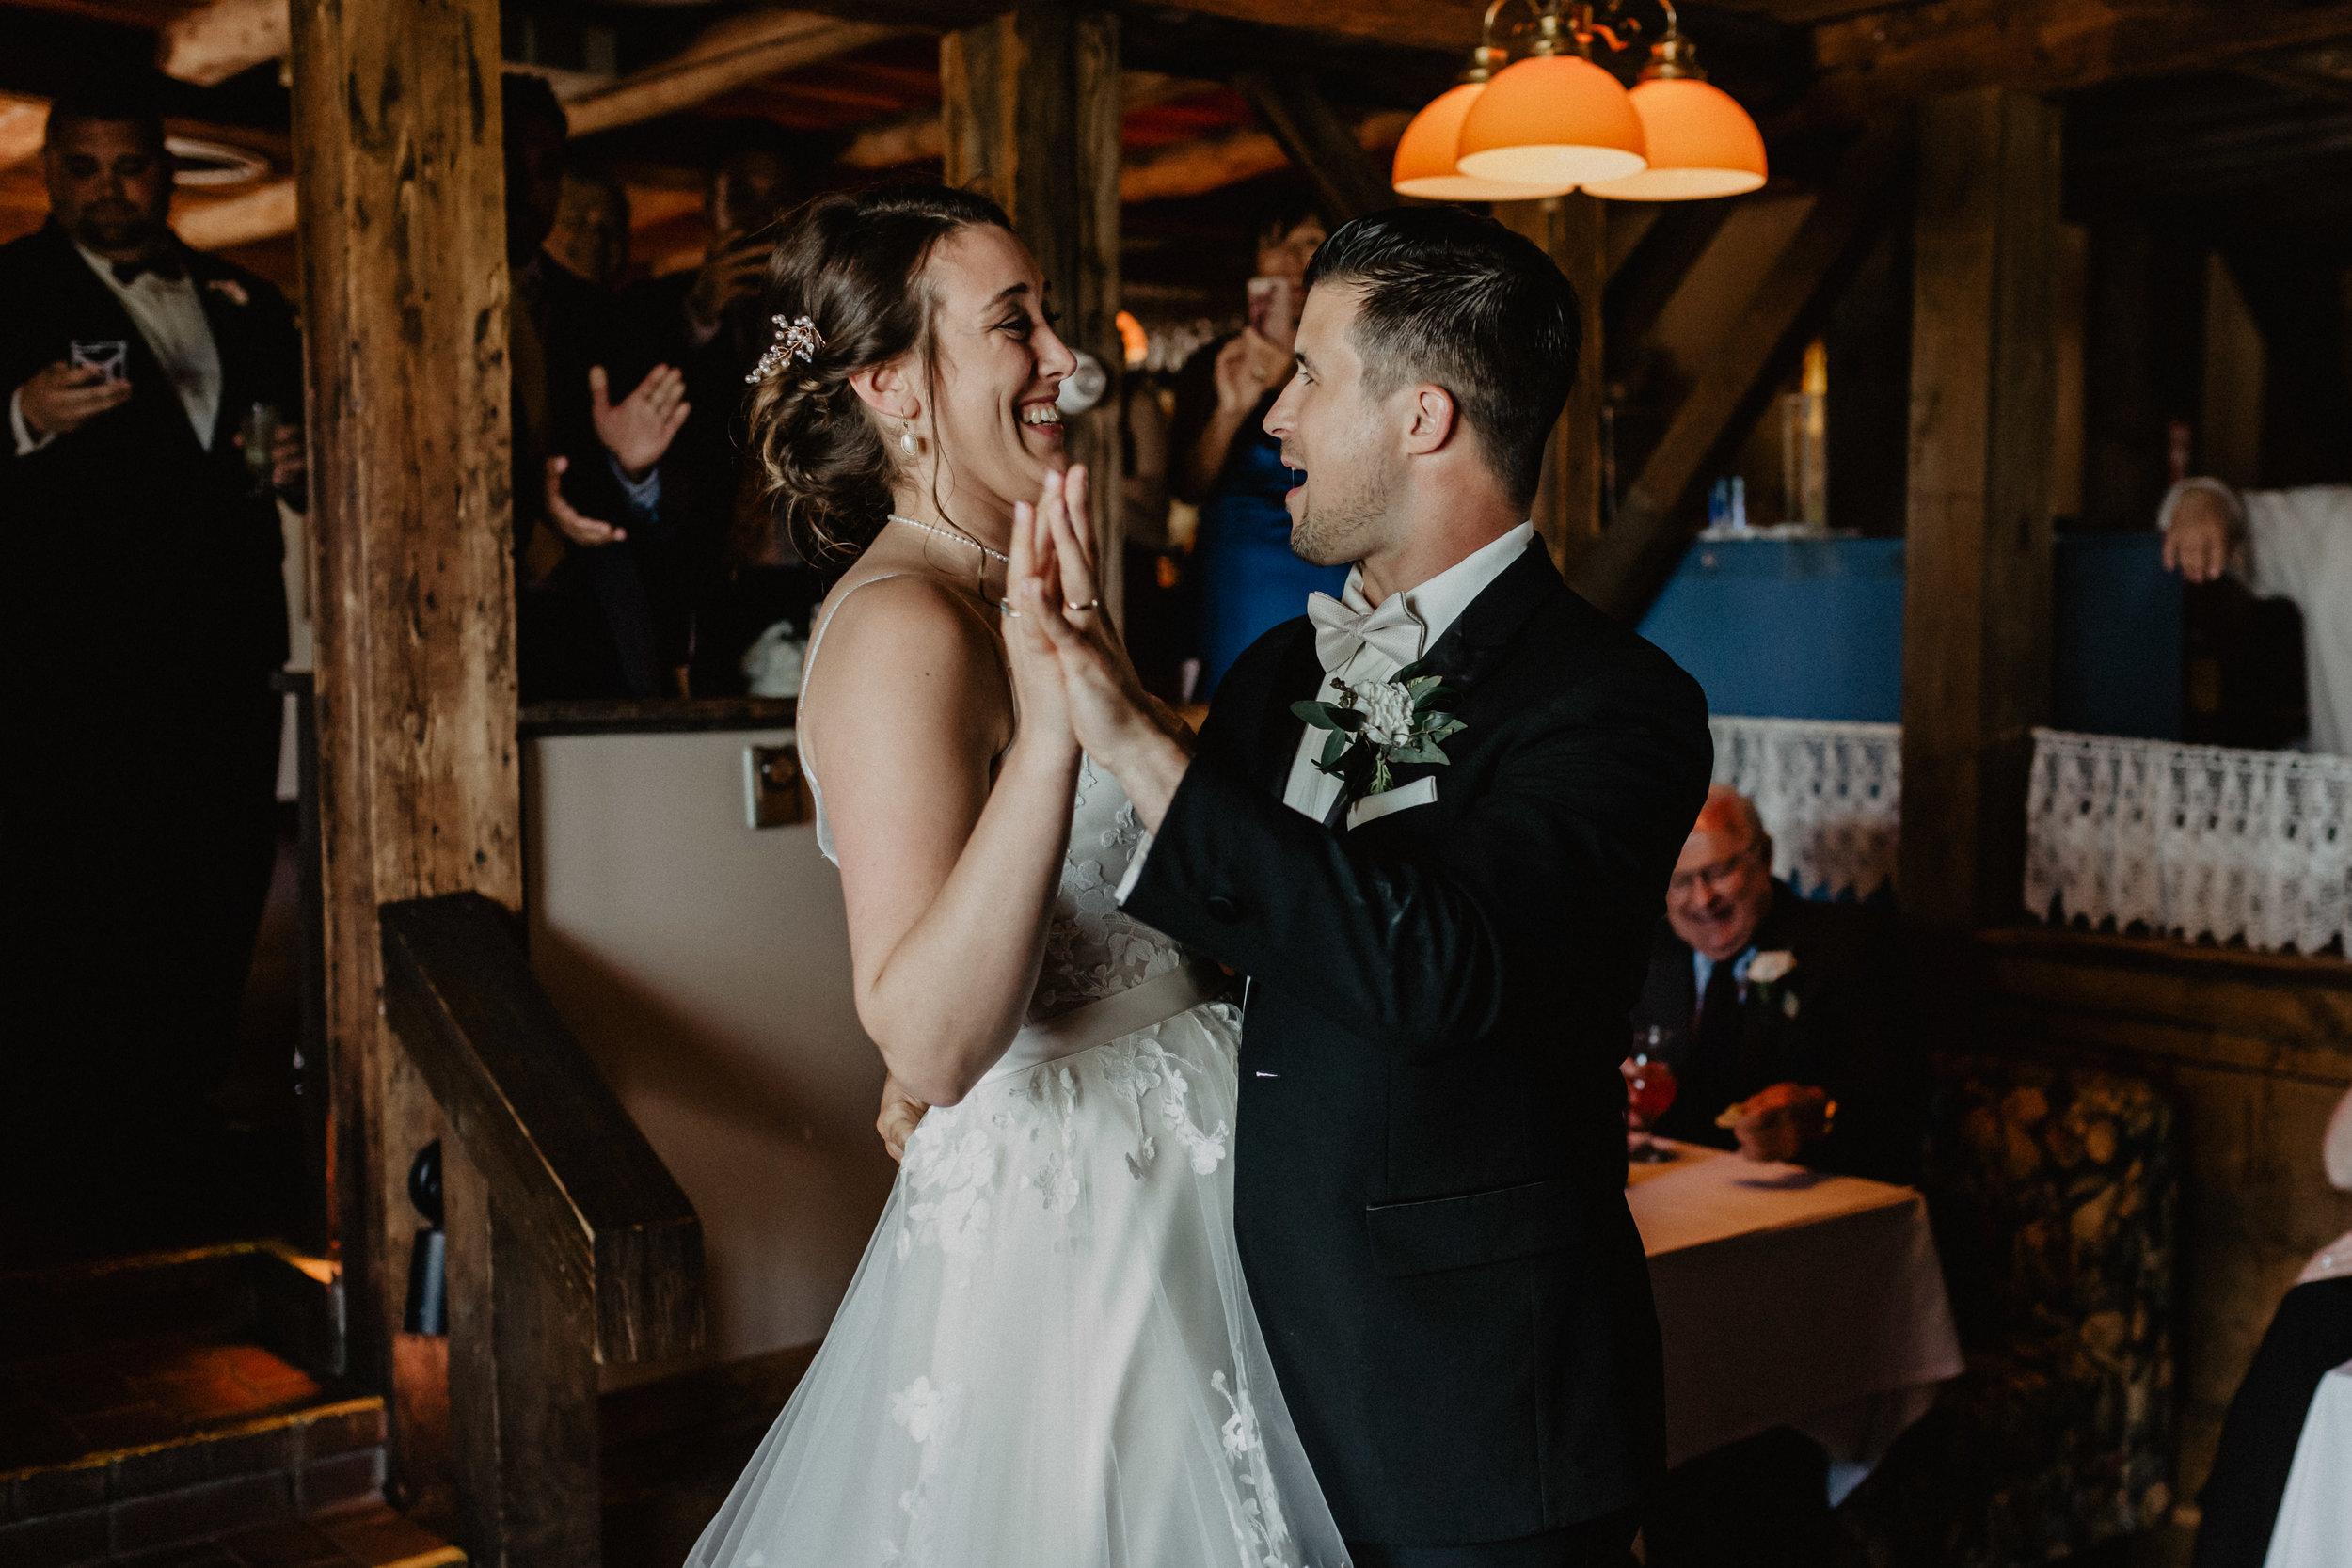 upstate_ny_wedding-44.jpg